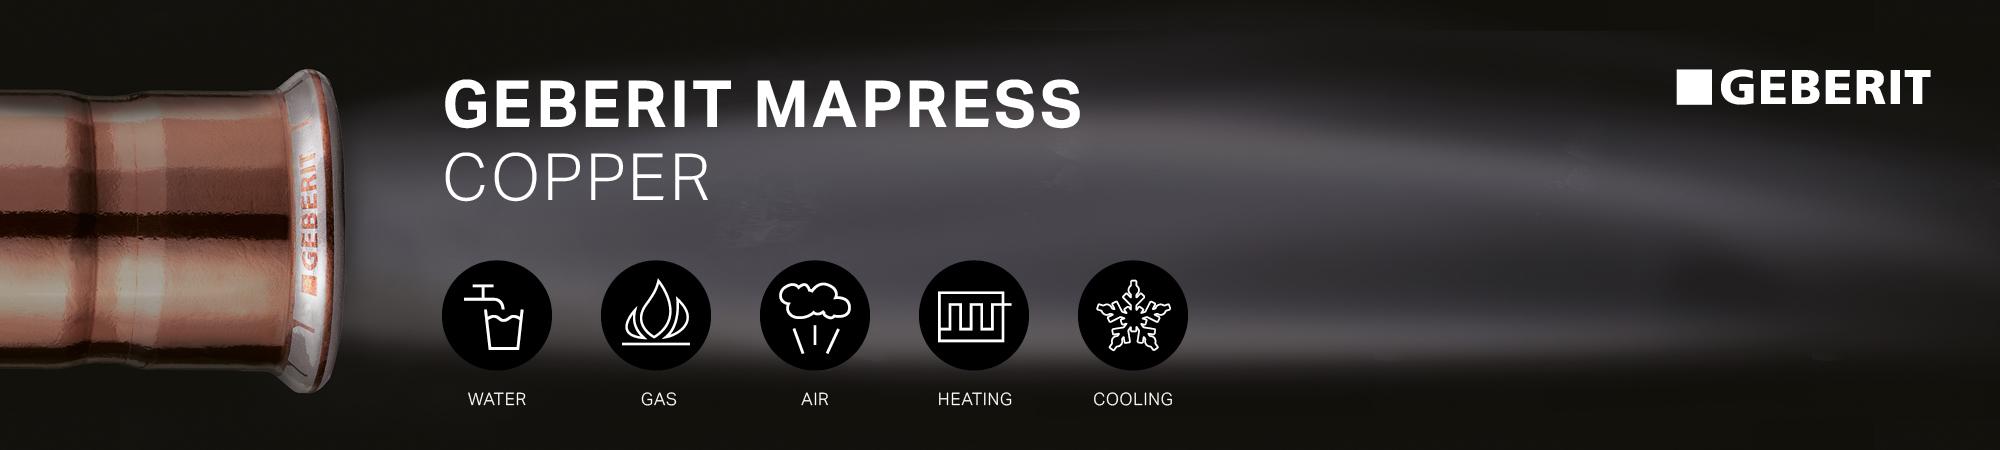 Geberit Mapress Copper